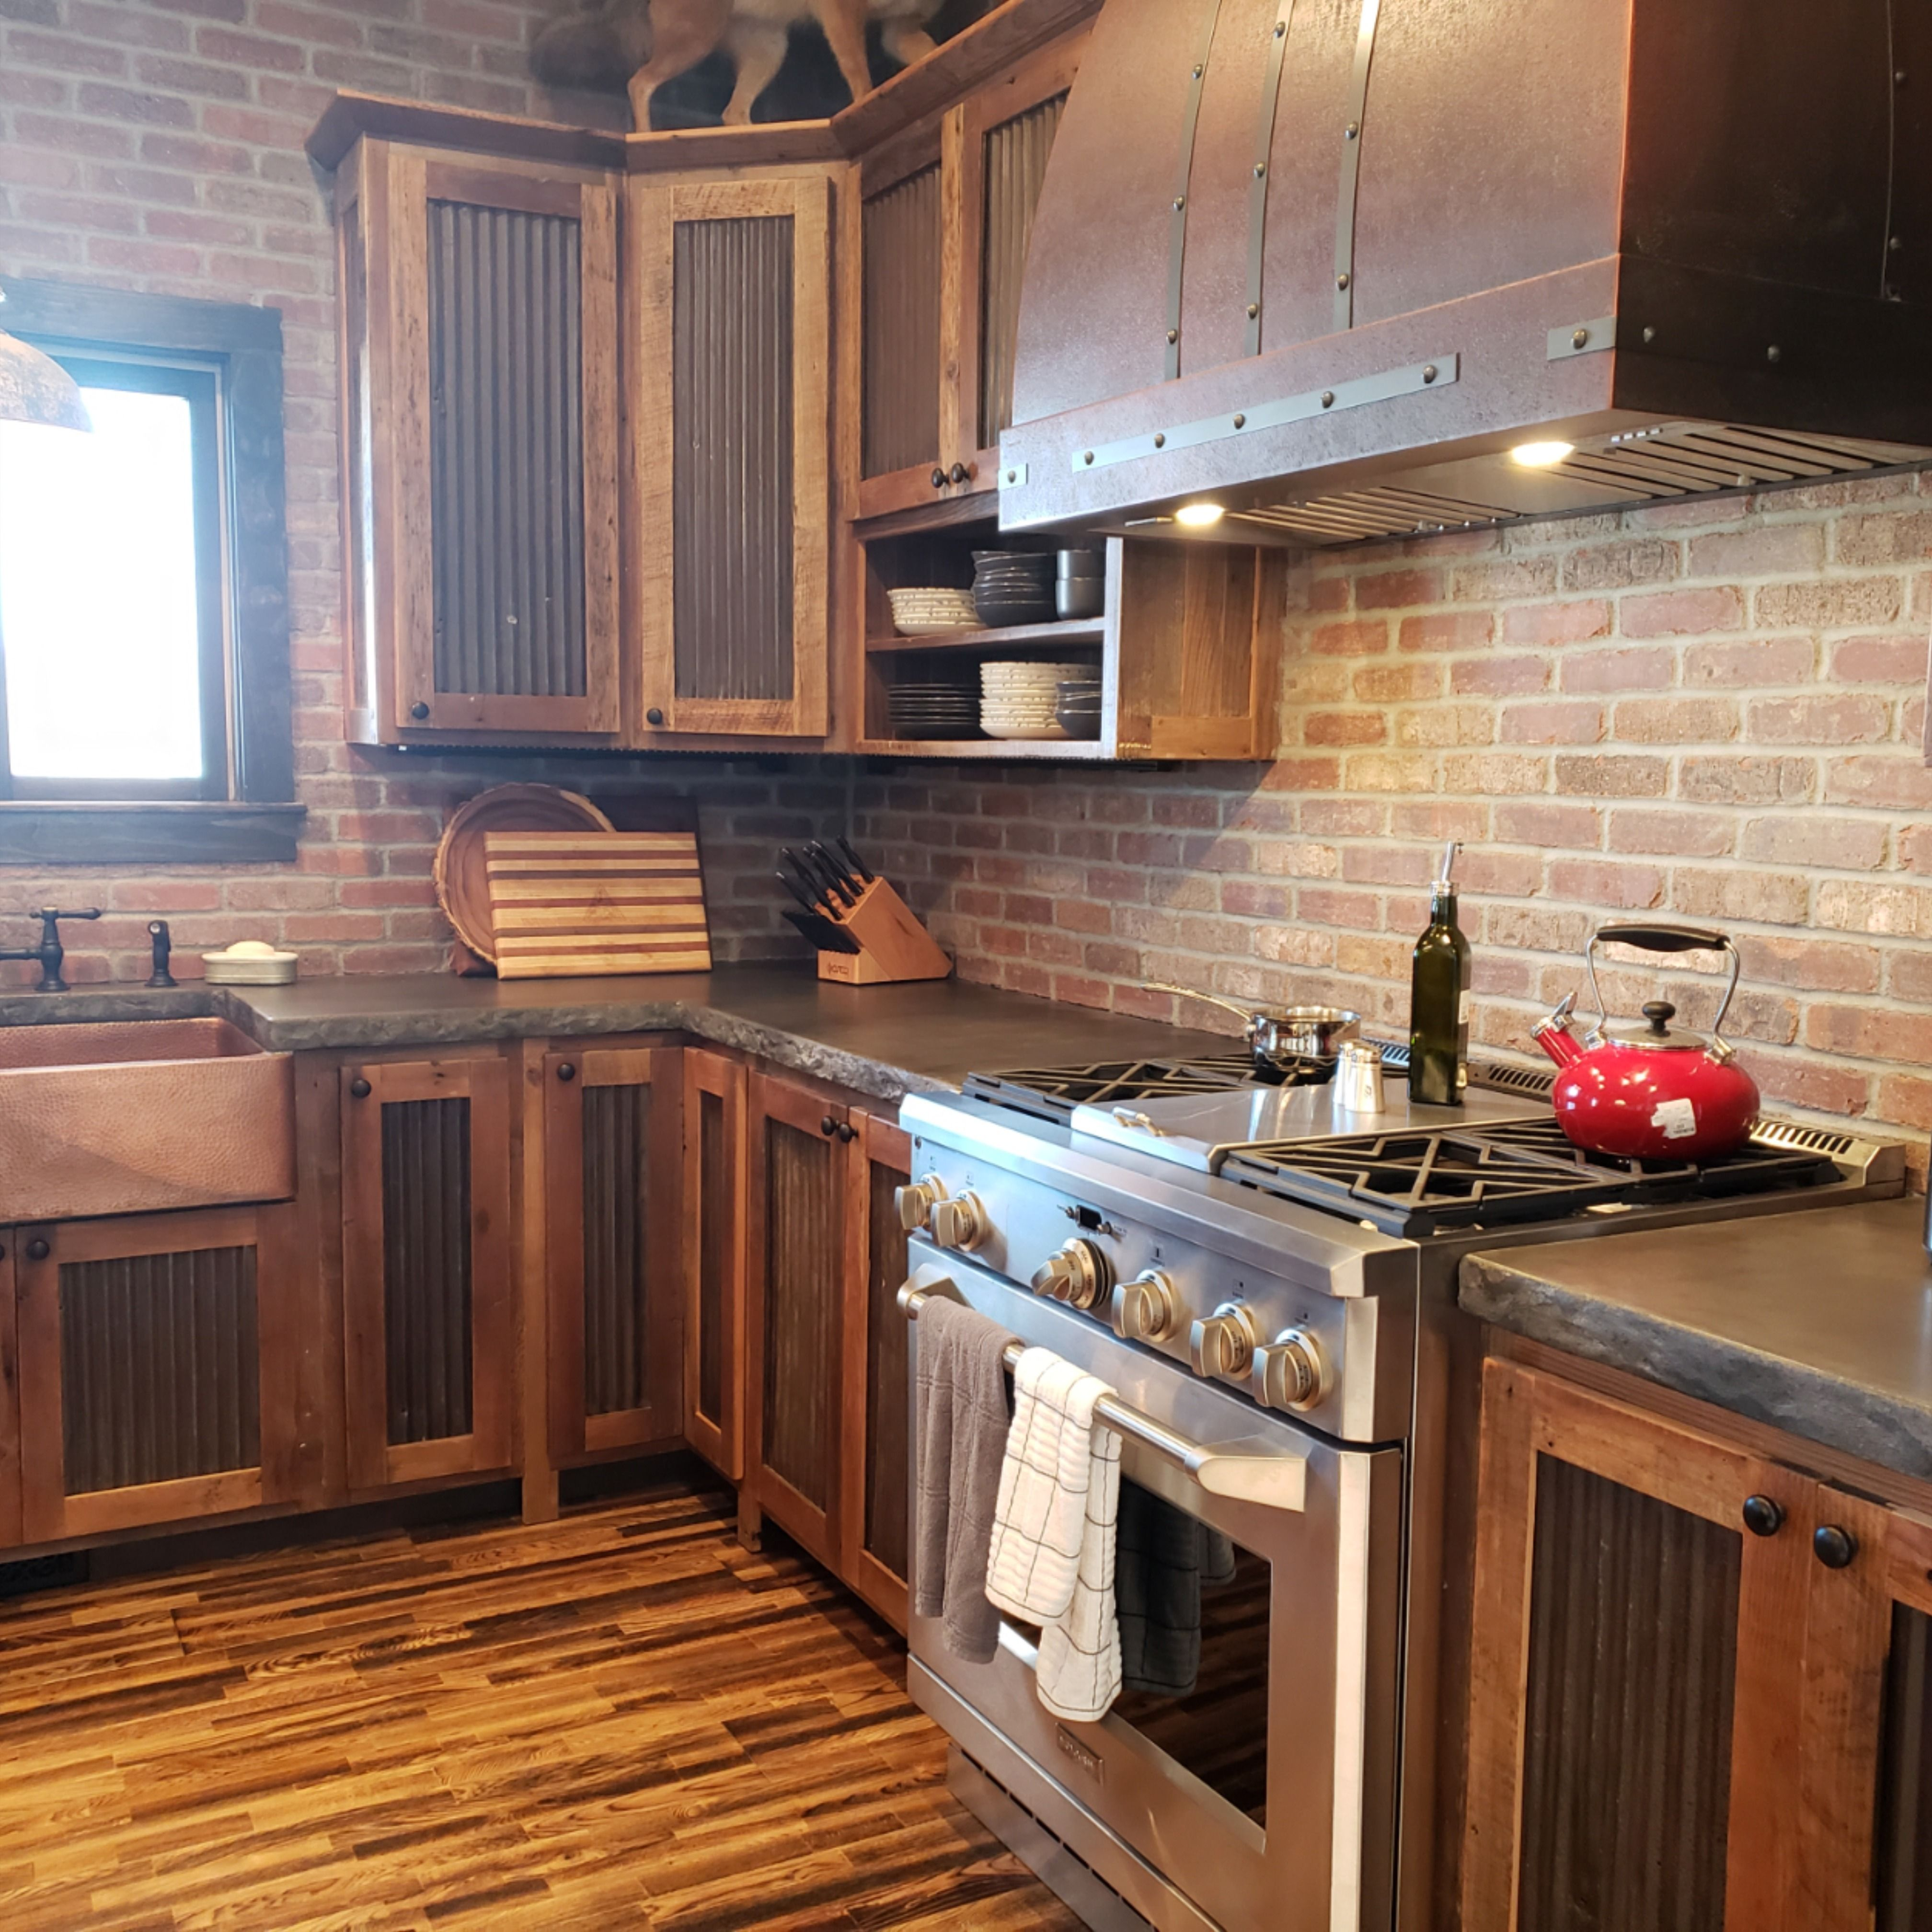 Farmhouse Kitchen In Barnwood Cabin In 2020 Kitchen Cabinet Door Styles Kitchen Cabinet Styles Rustic Kitchen Cabinets